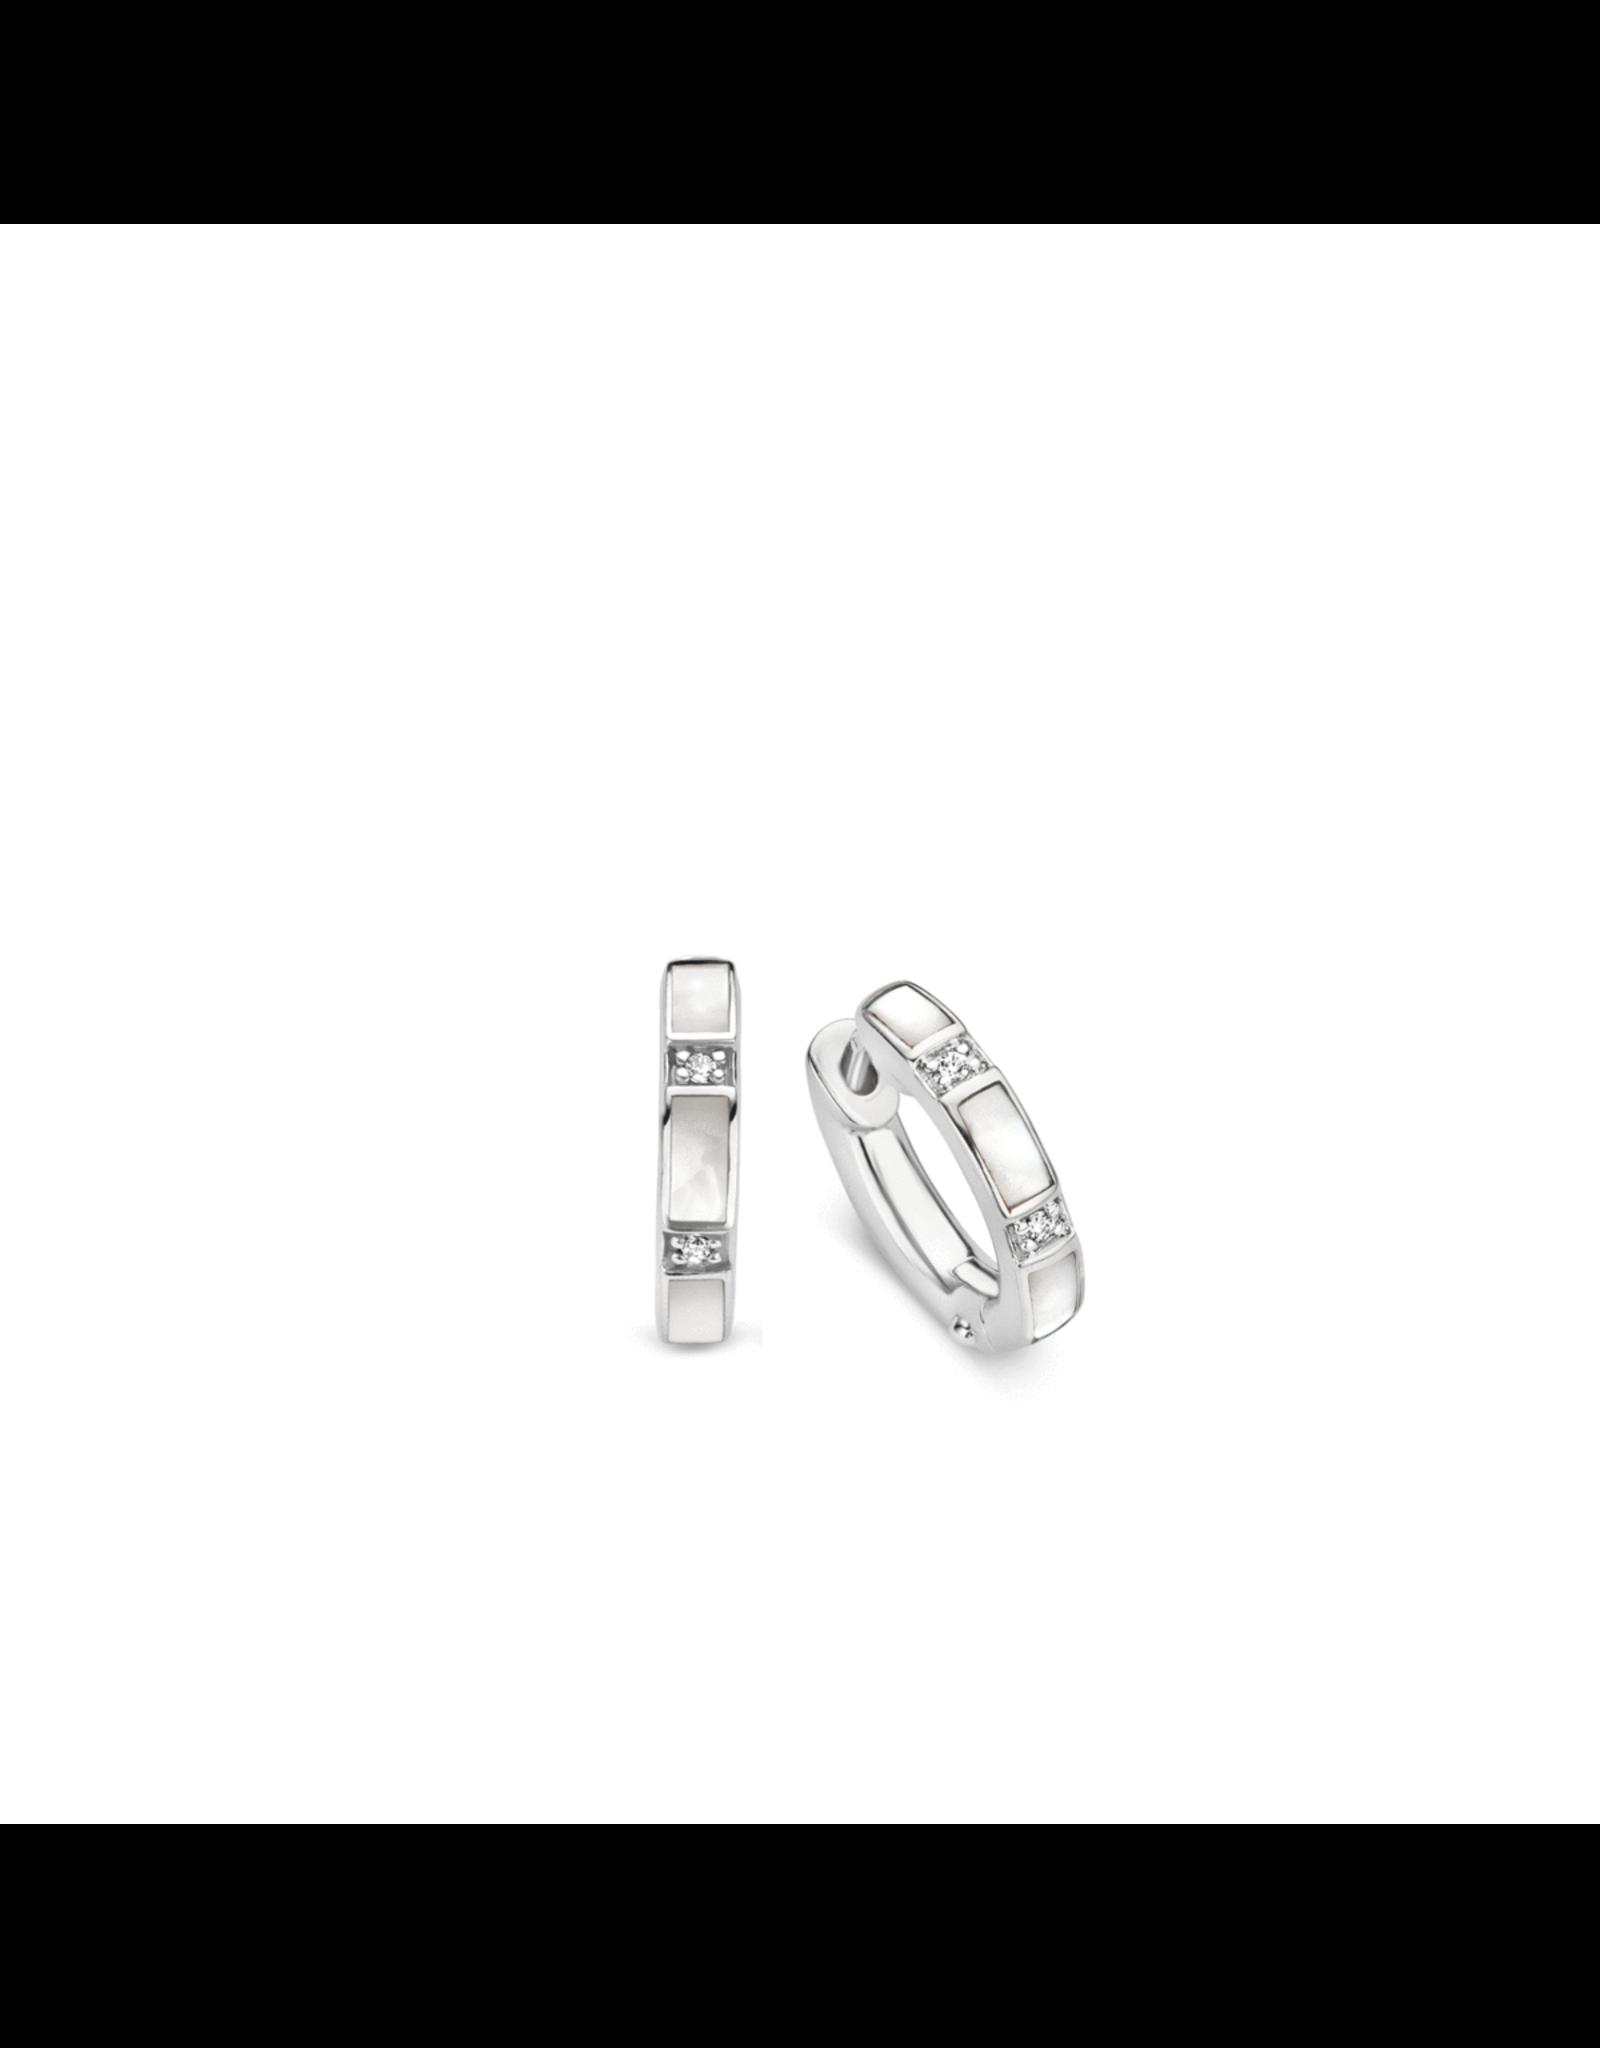 Silver Mother of Pearl Huggie Earrings- 7714MW